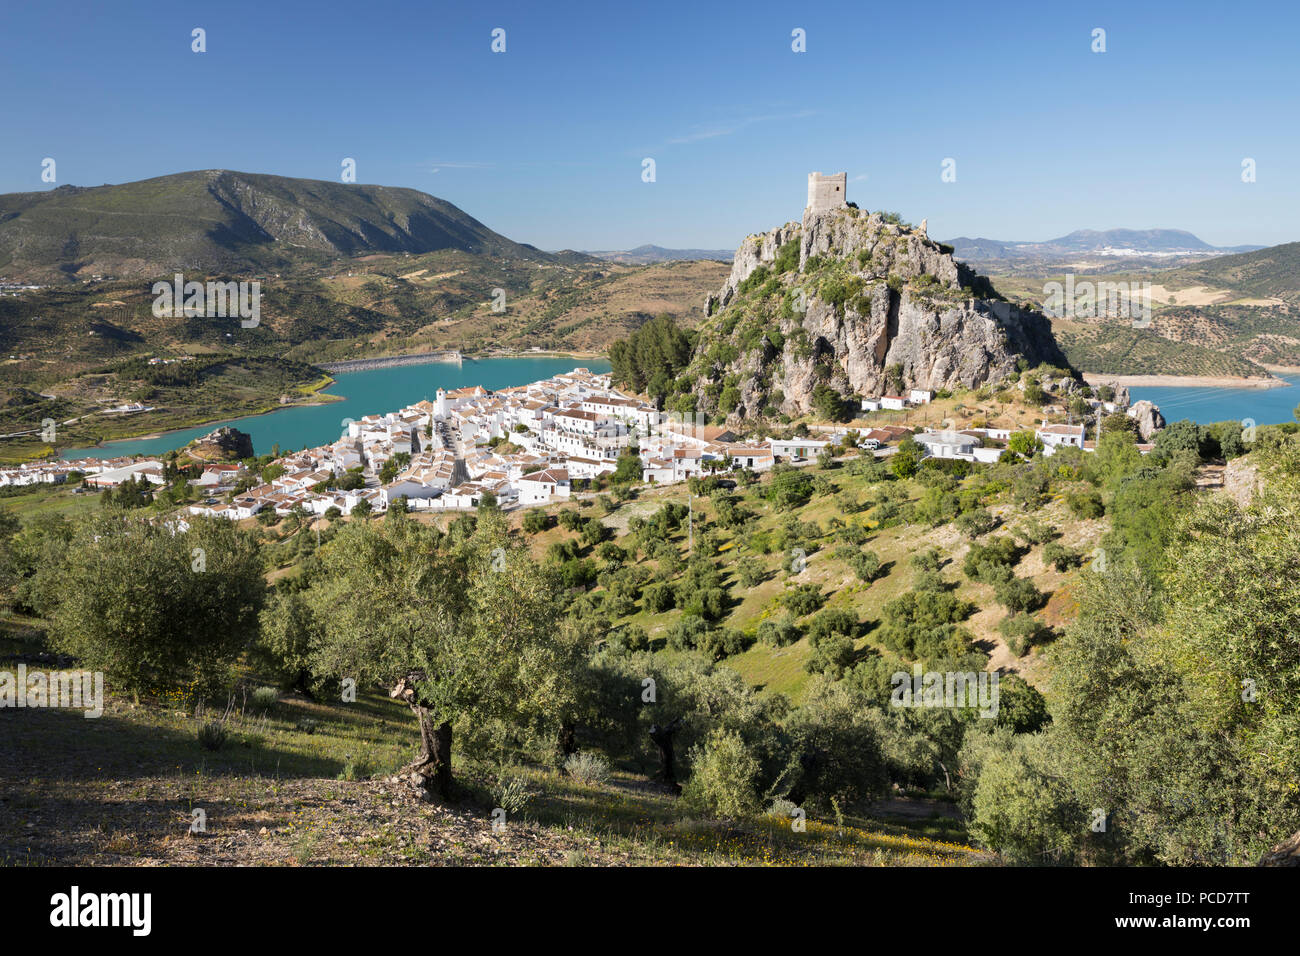 Moorish castle above white village with olive groves, Zahara de la Sierra, Sierra de Grazalema Natural Park, Andalucia, Spain, Europe Stock Photo